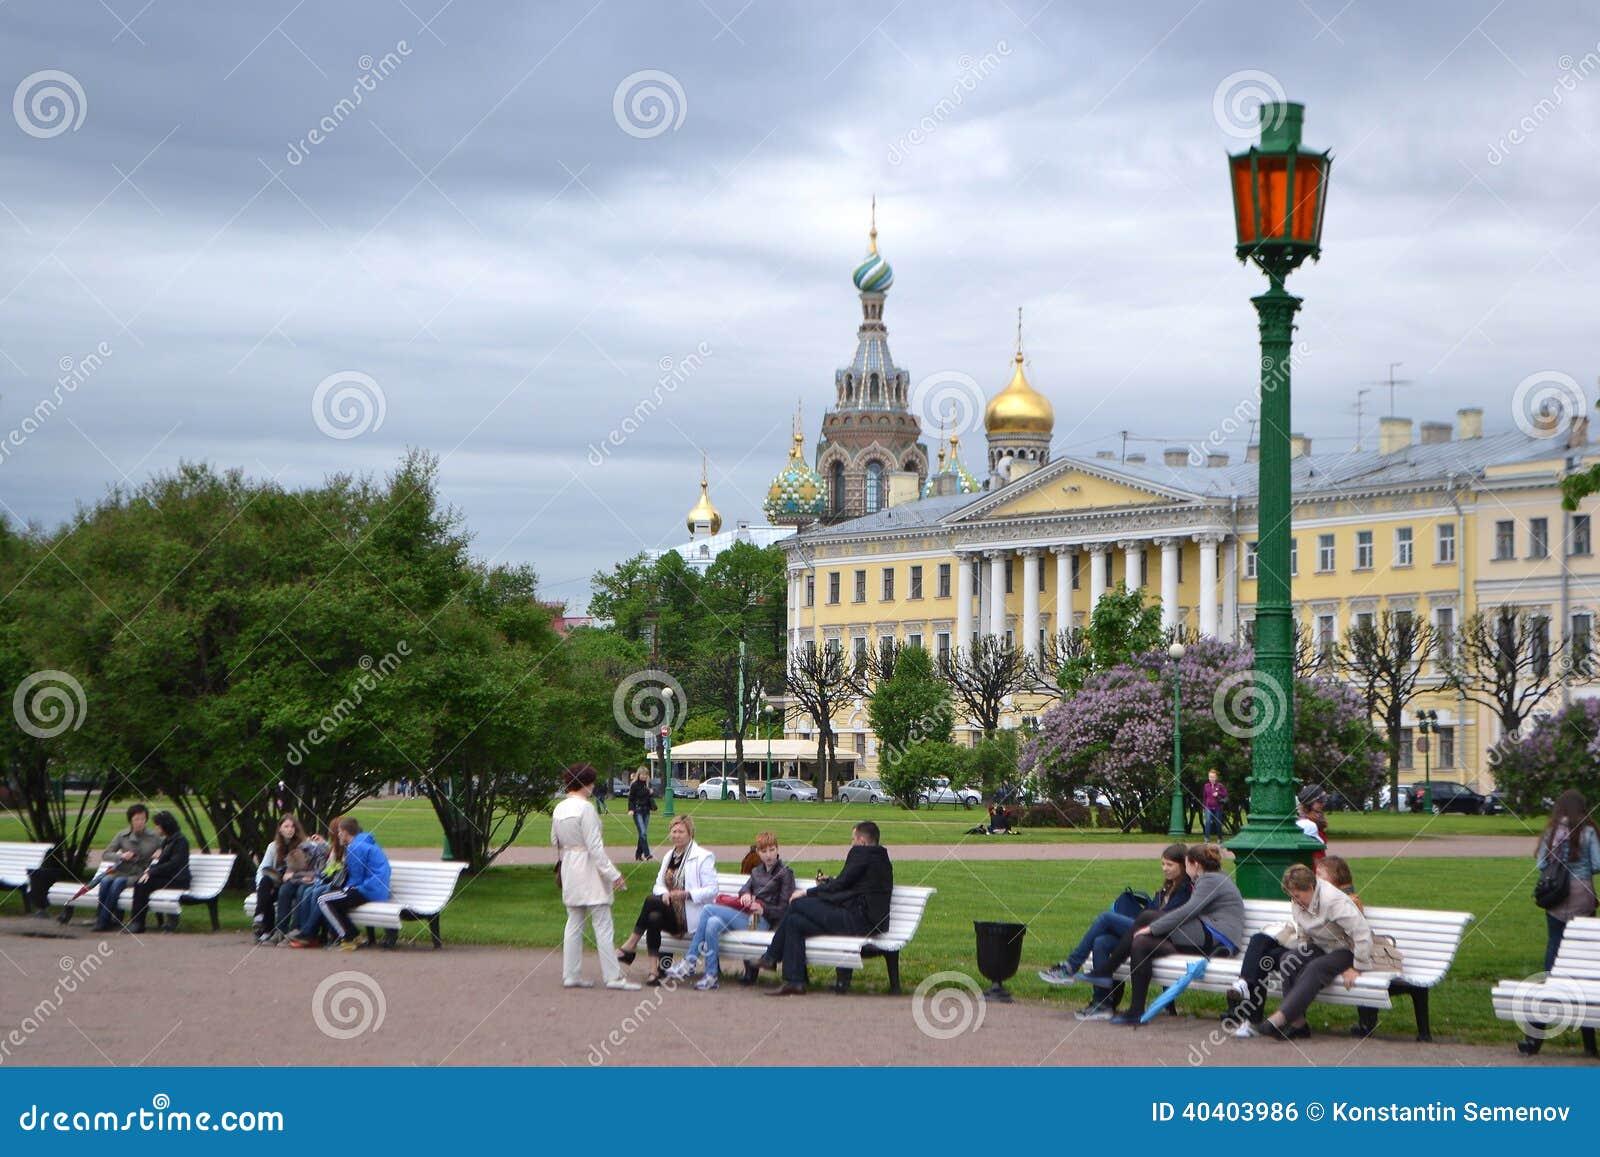 russia trip to mars - photo #40